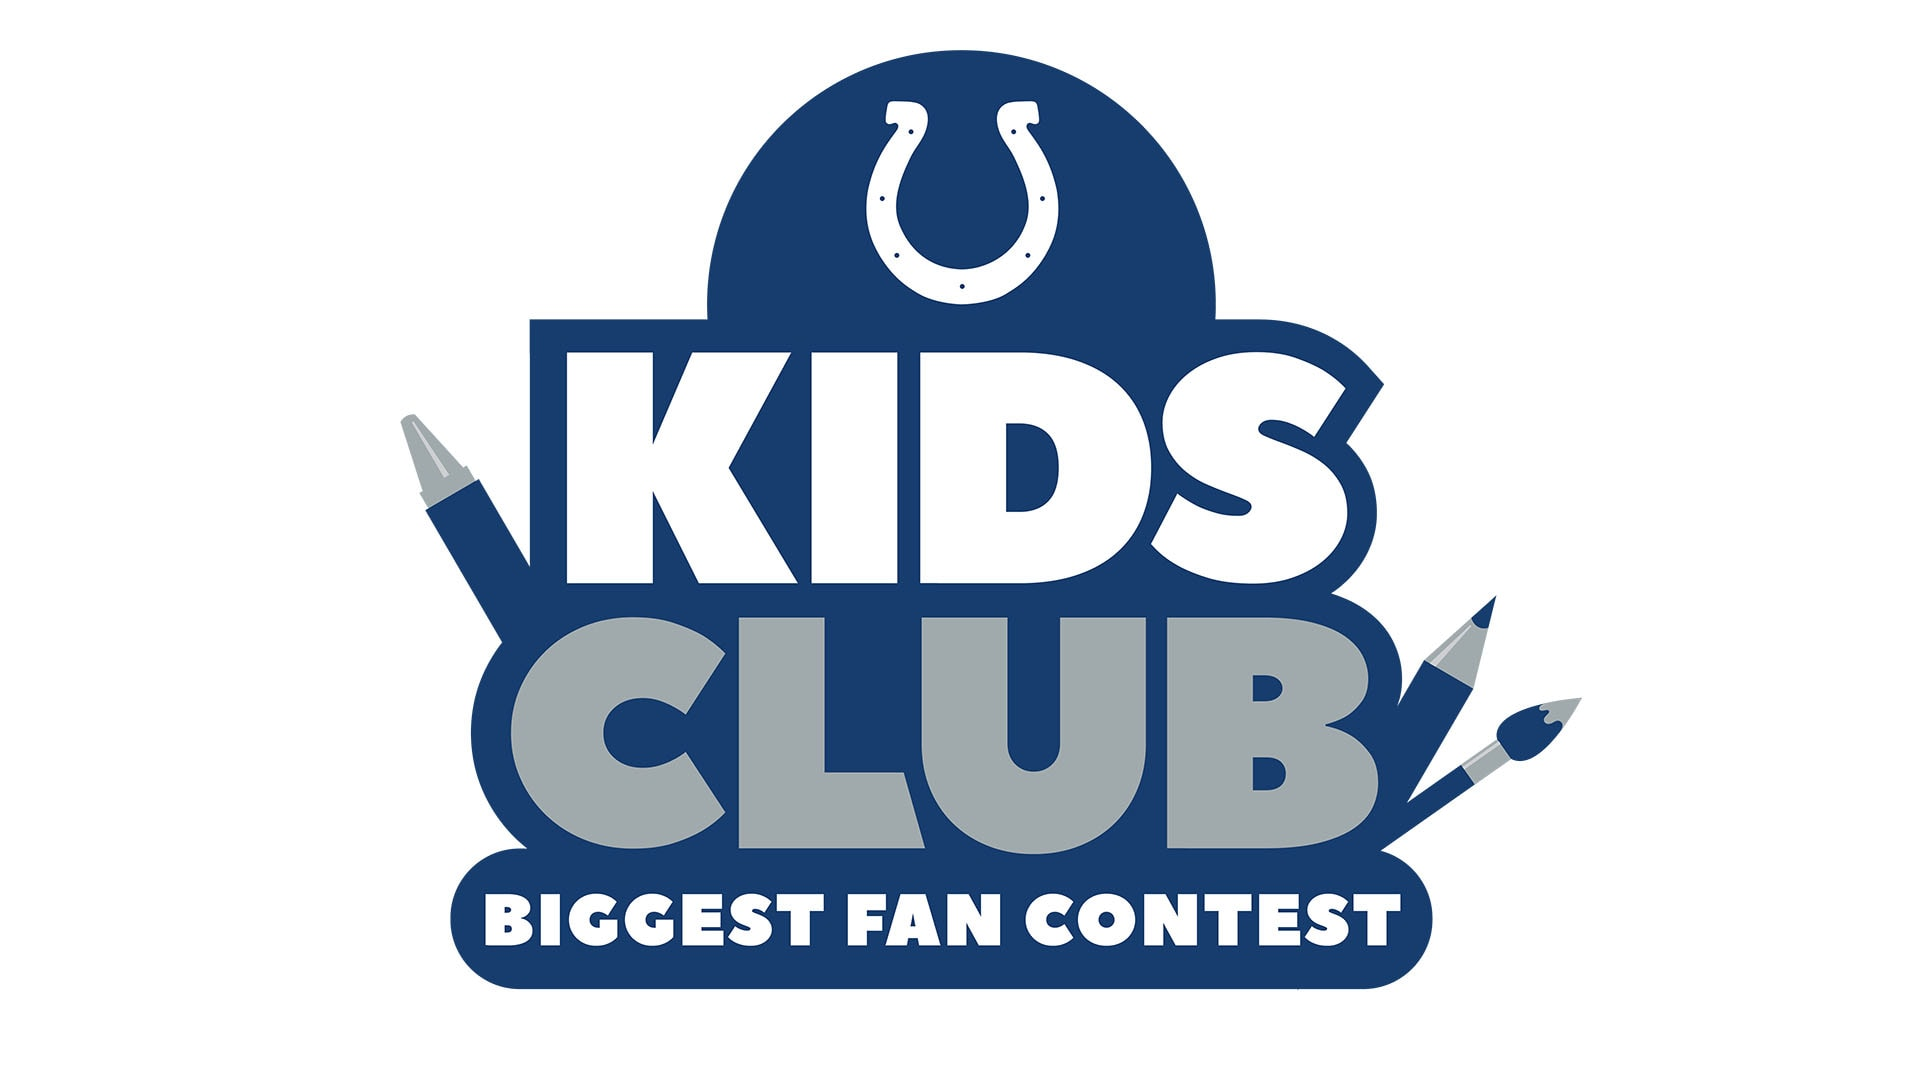 Biggest Fan Contest